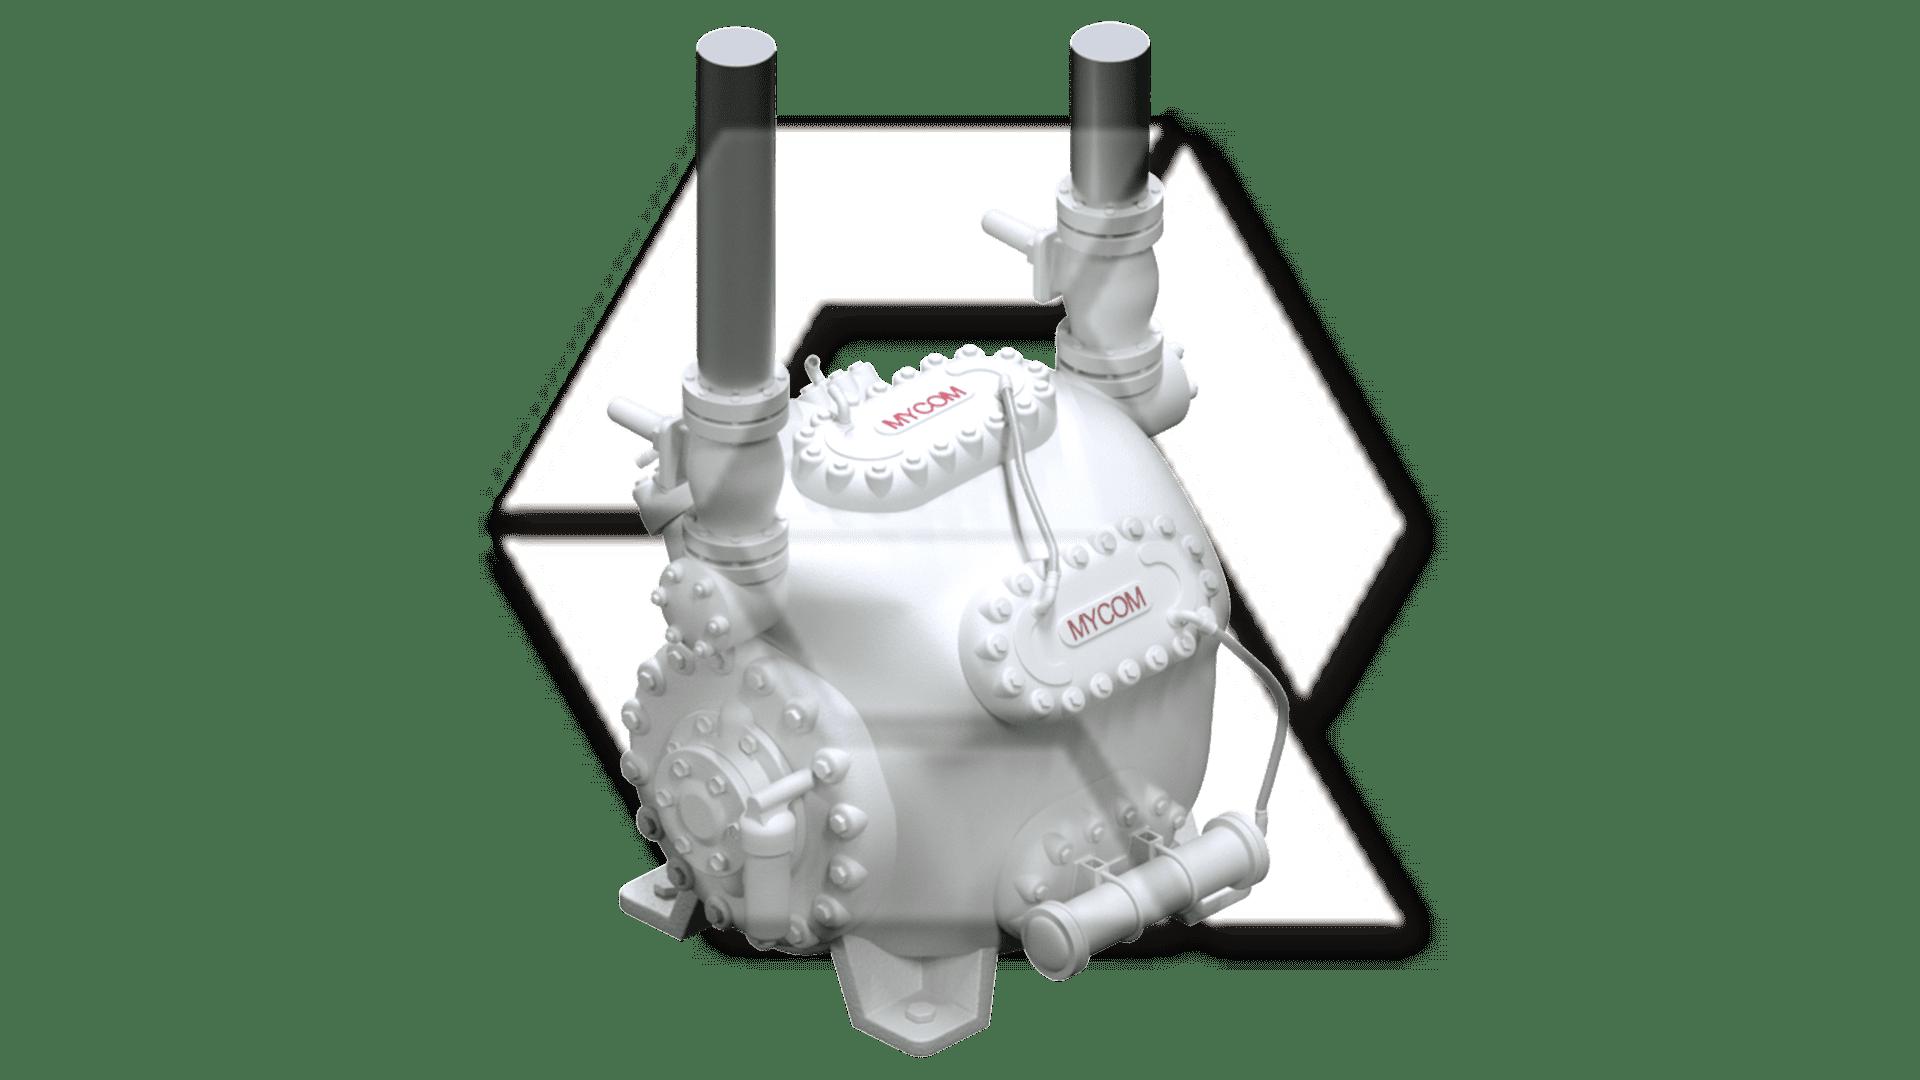 Mycomm Compressor 1